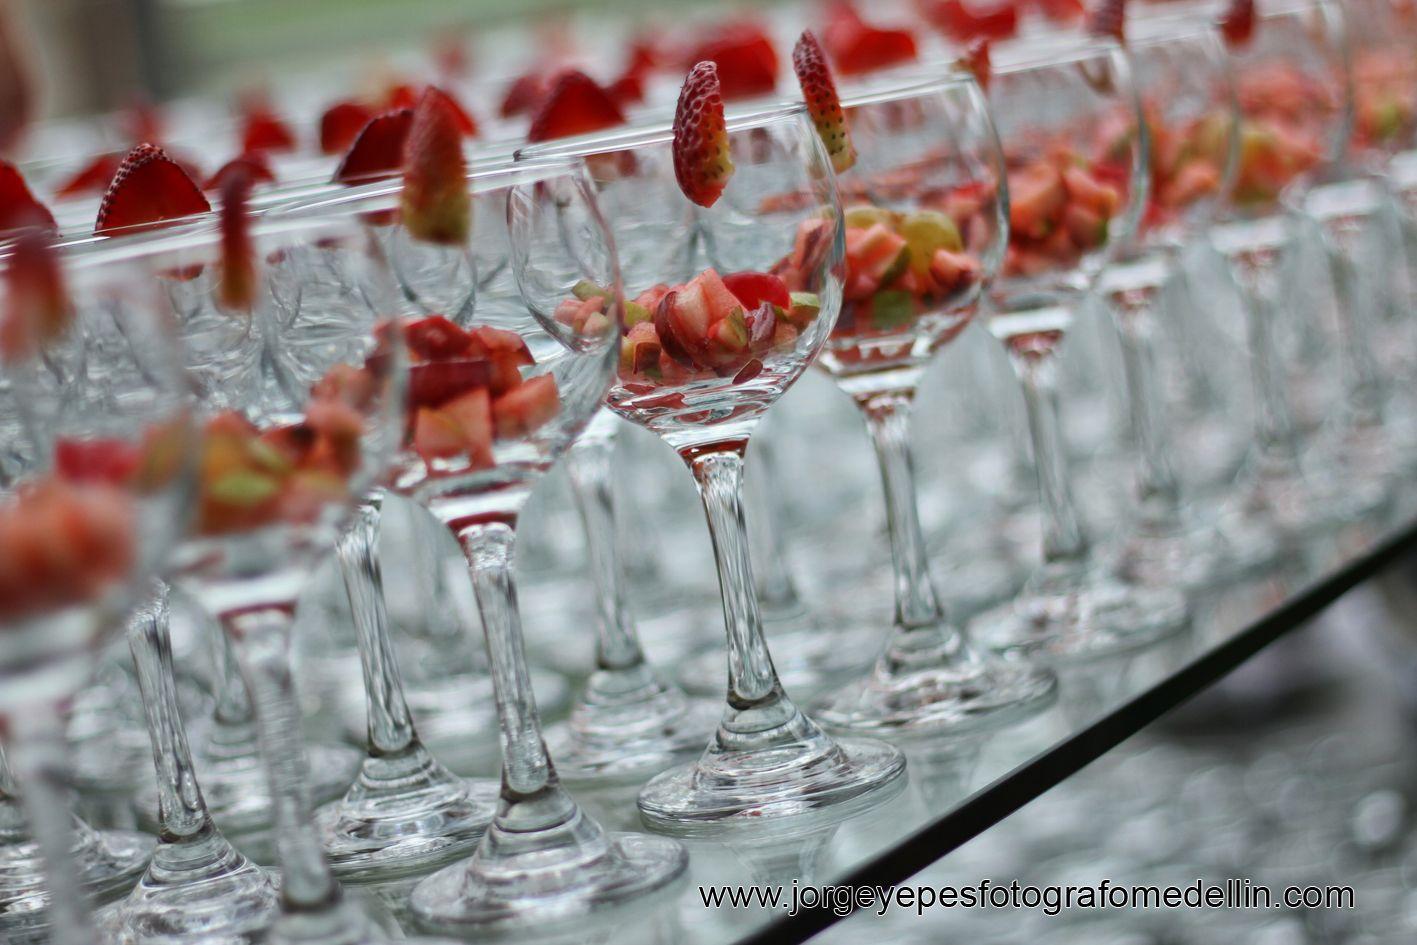 Copa de sangria #love #amor #copas #sangria #fruta #natural